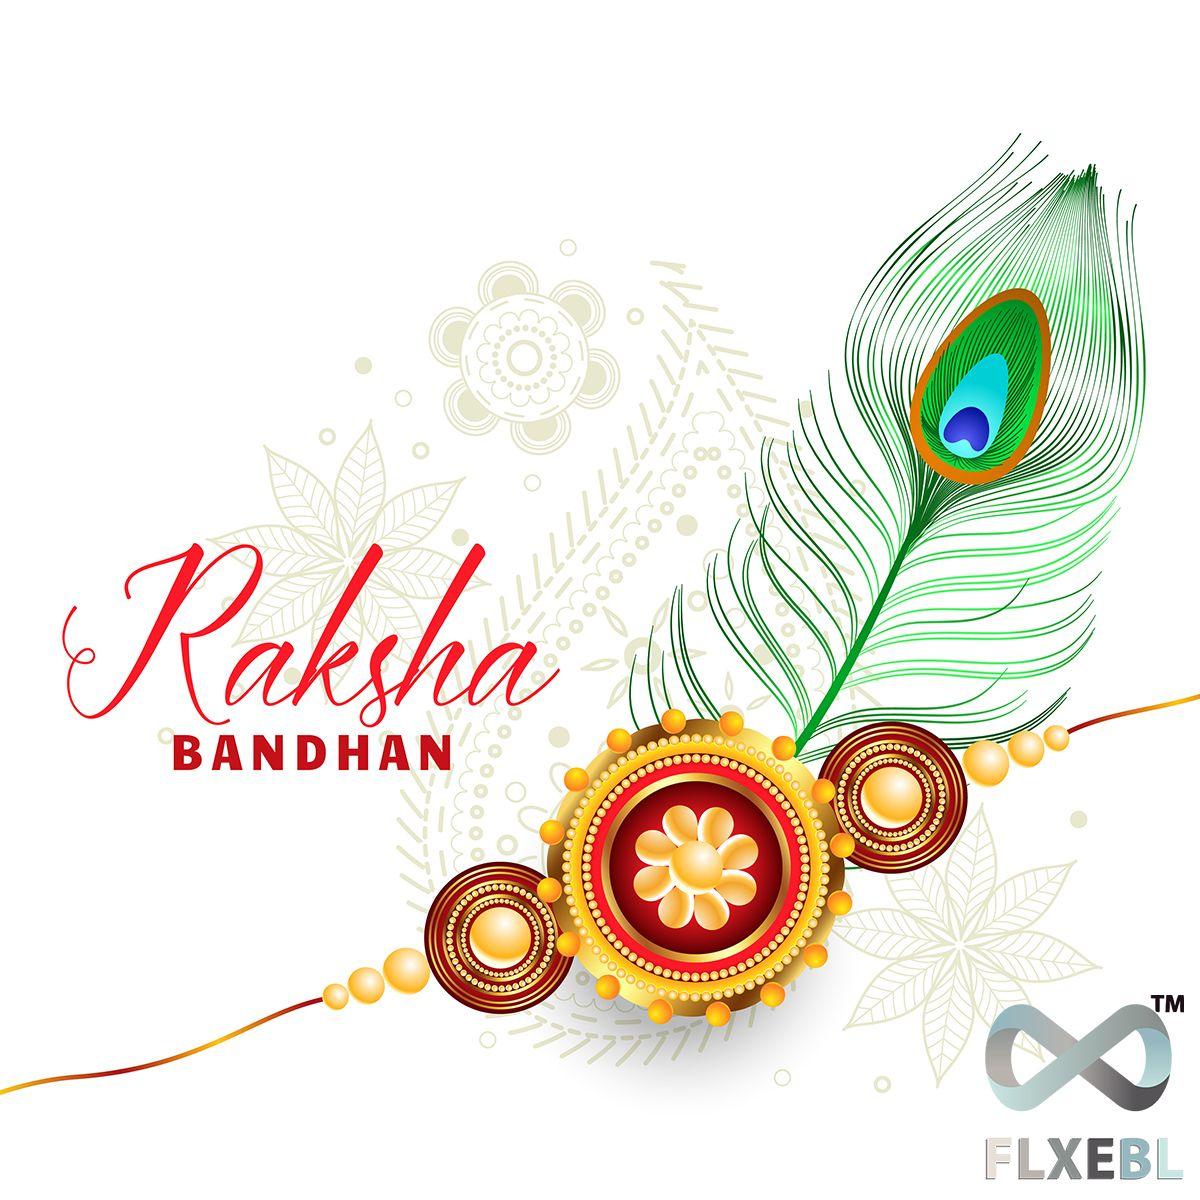 Rakhi A holy thread Happy rakshabandhan, Happy rakhi